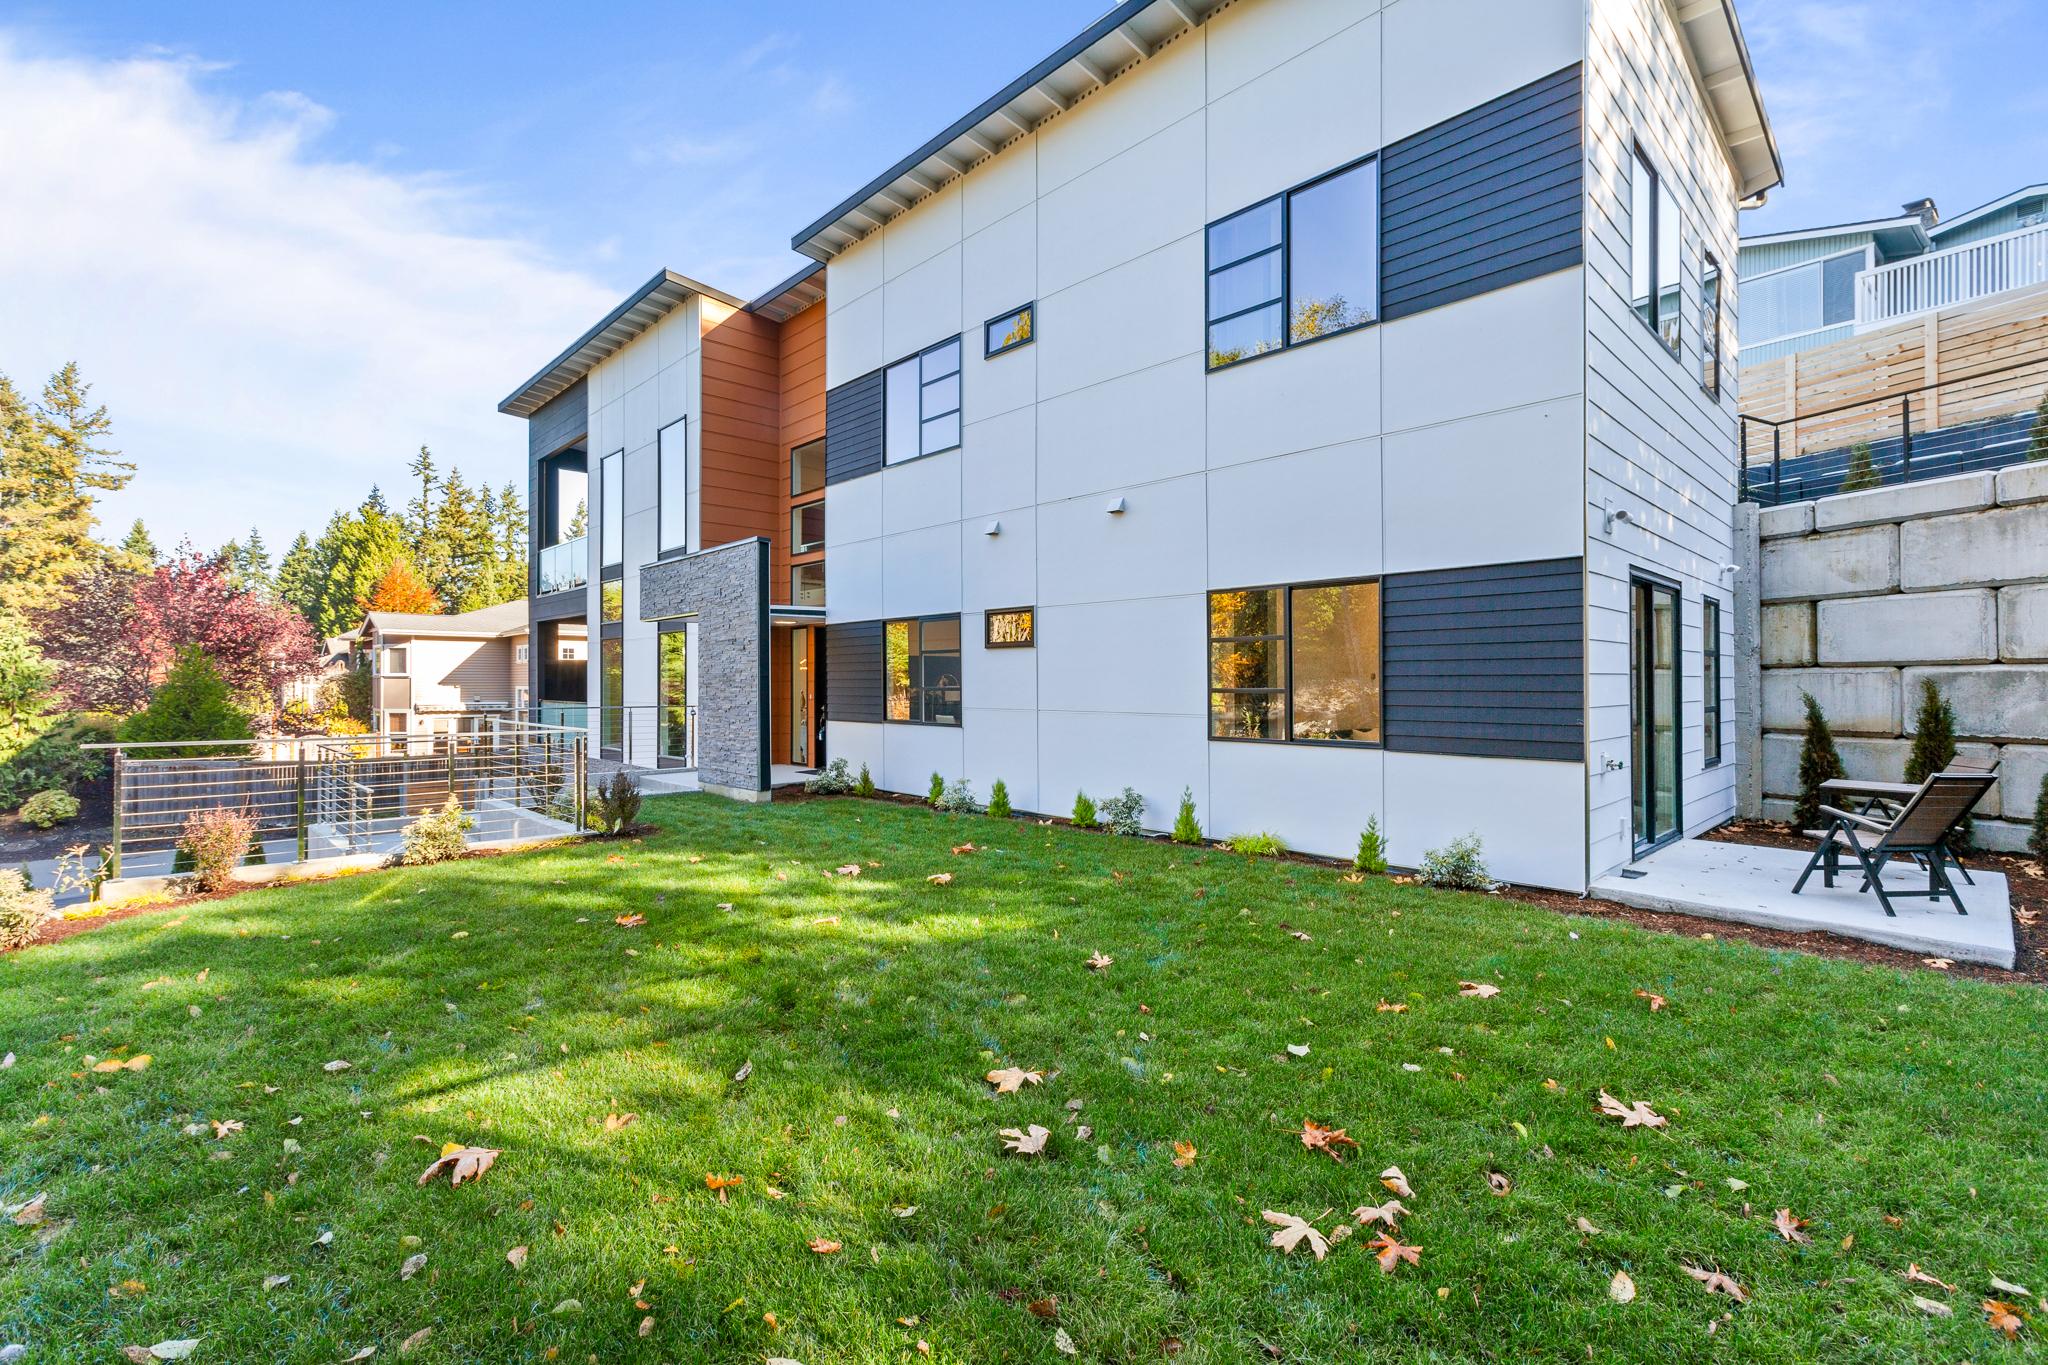 Exterior - Luxury Real Estate - 18109 84th Ave W, Edmonds